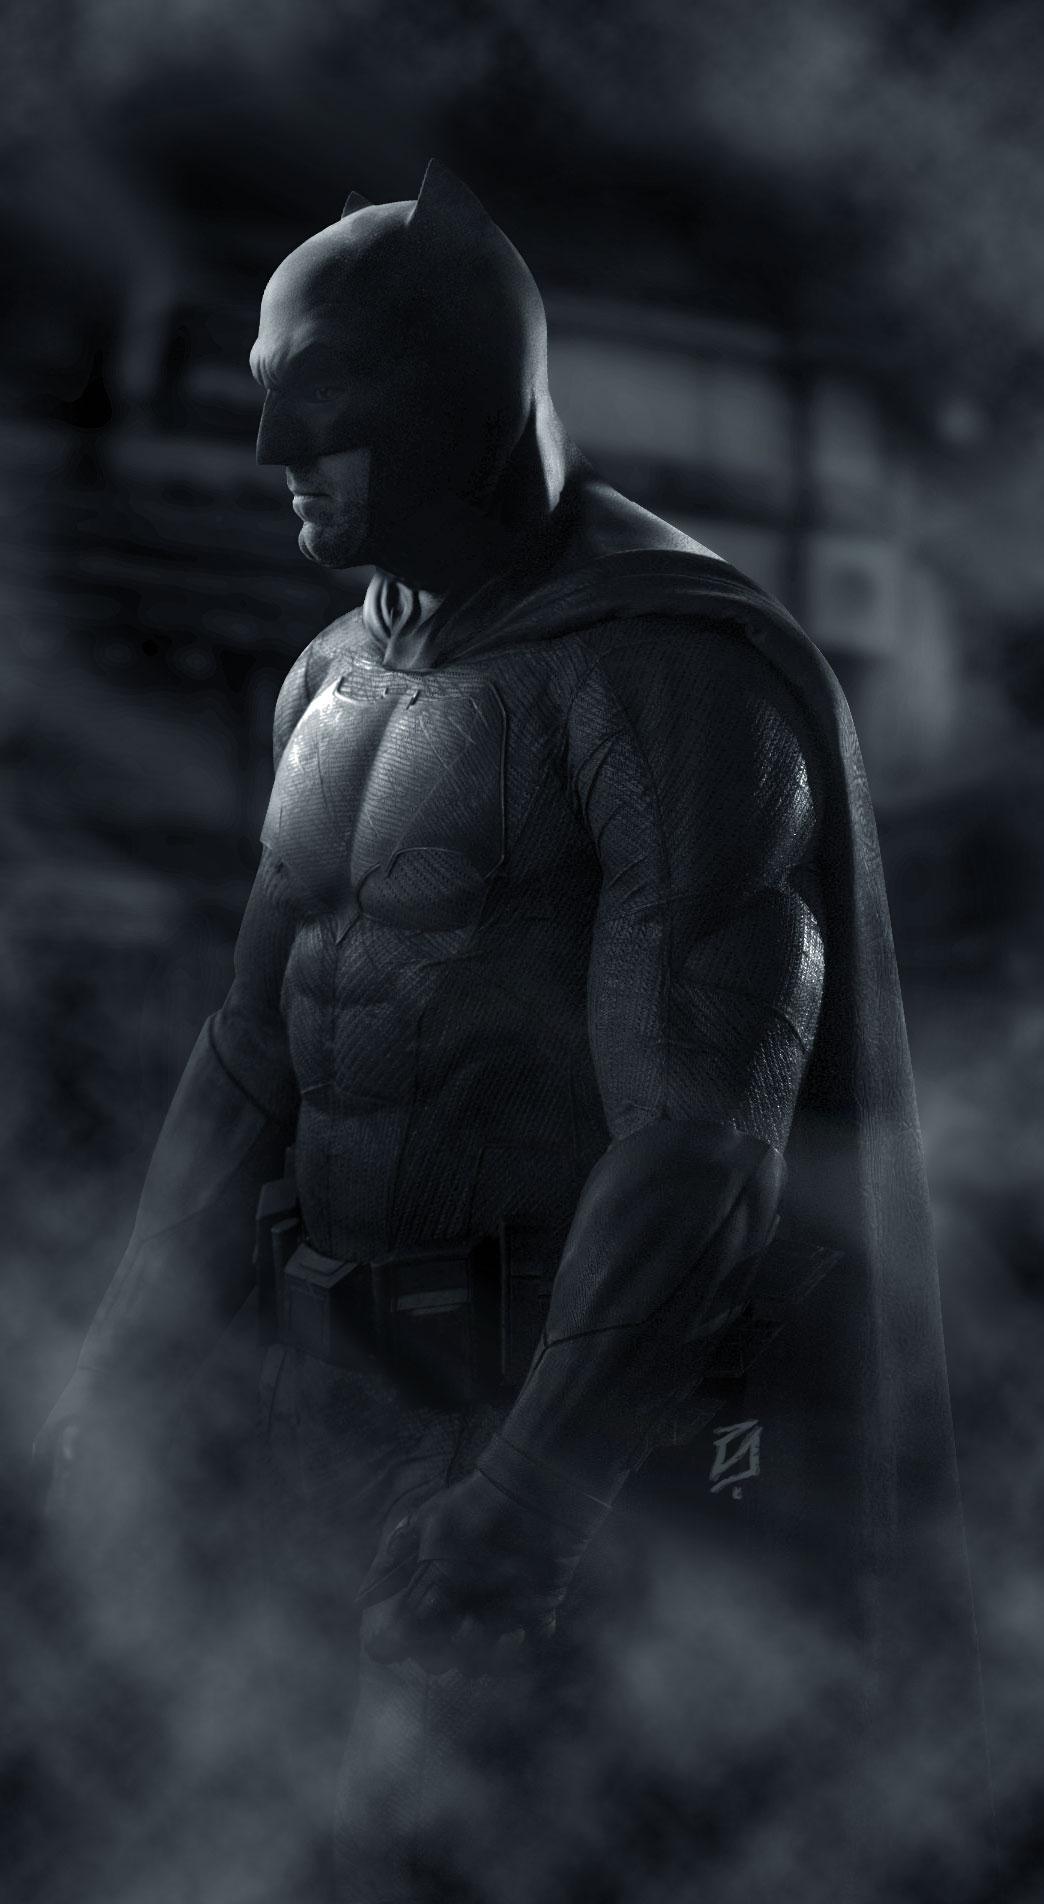 Batman v superman : Dawn of Justice - Page 2 Bvs_14_pk_by_patokali-d80eda0